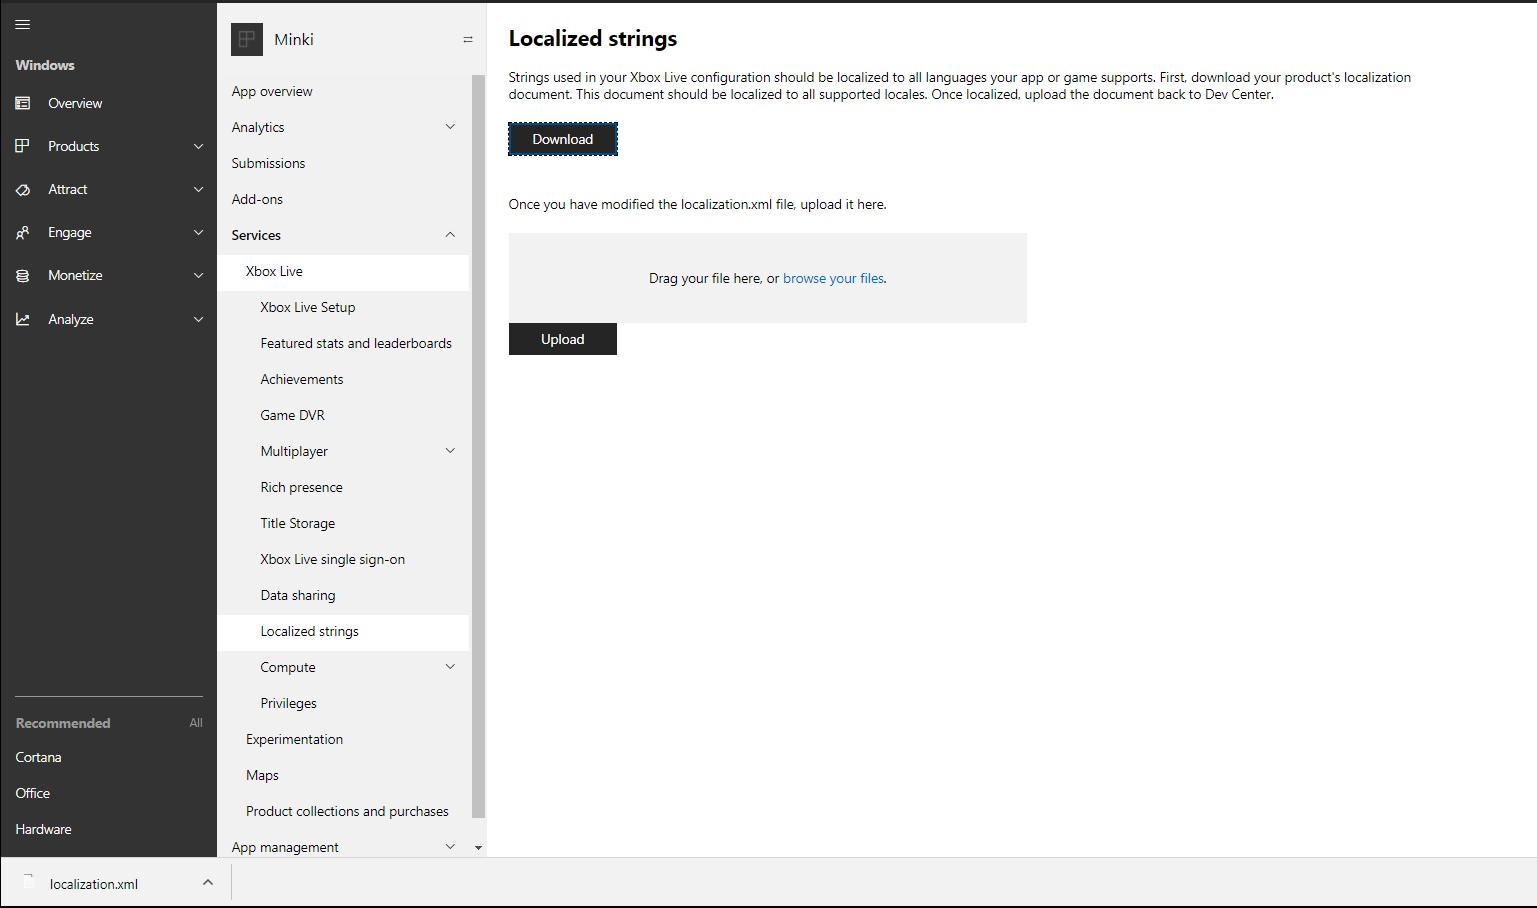 Localized strings - UWP app developer | Microsoft Docs